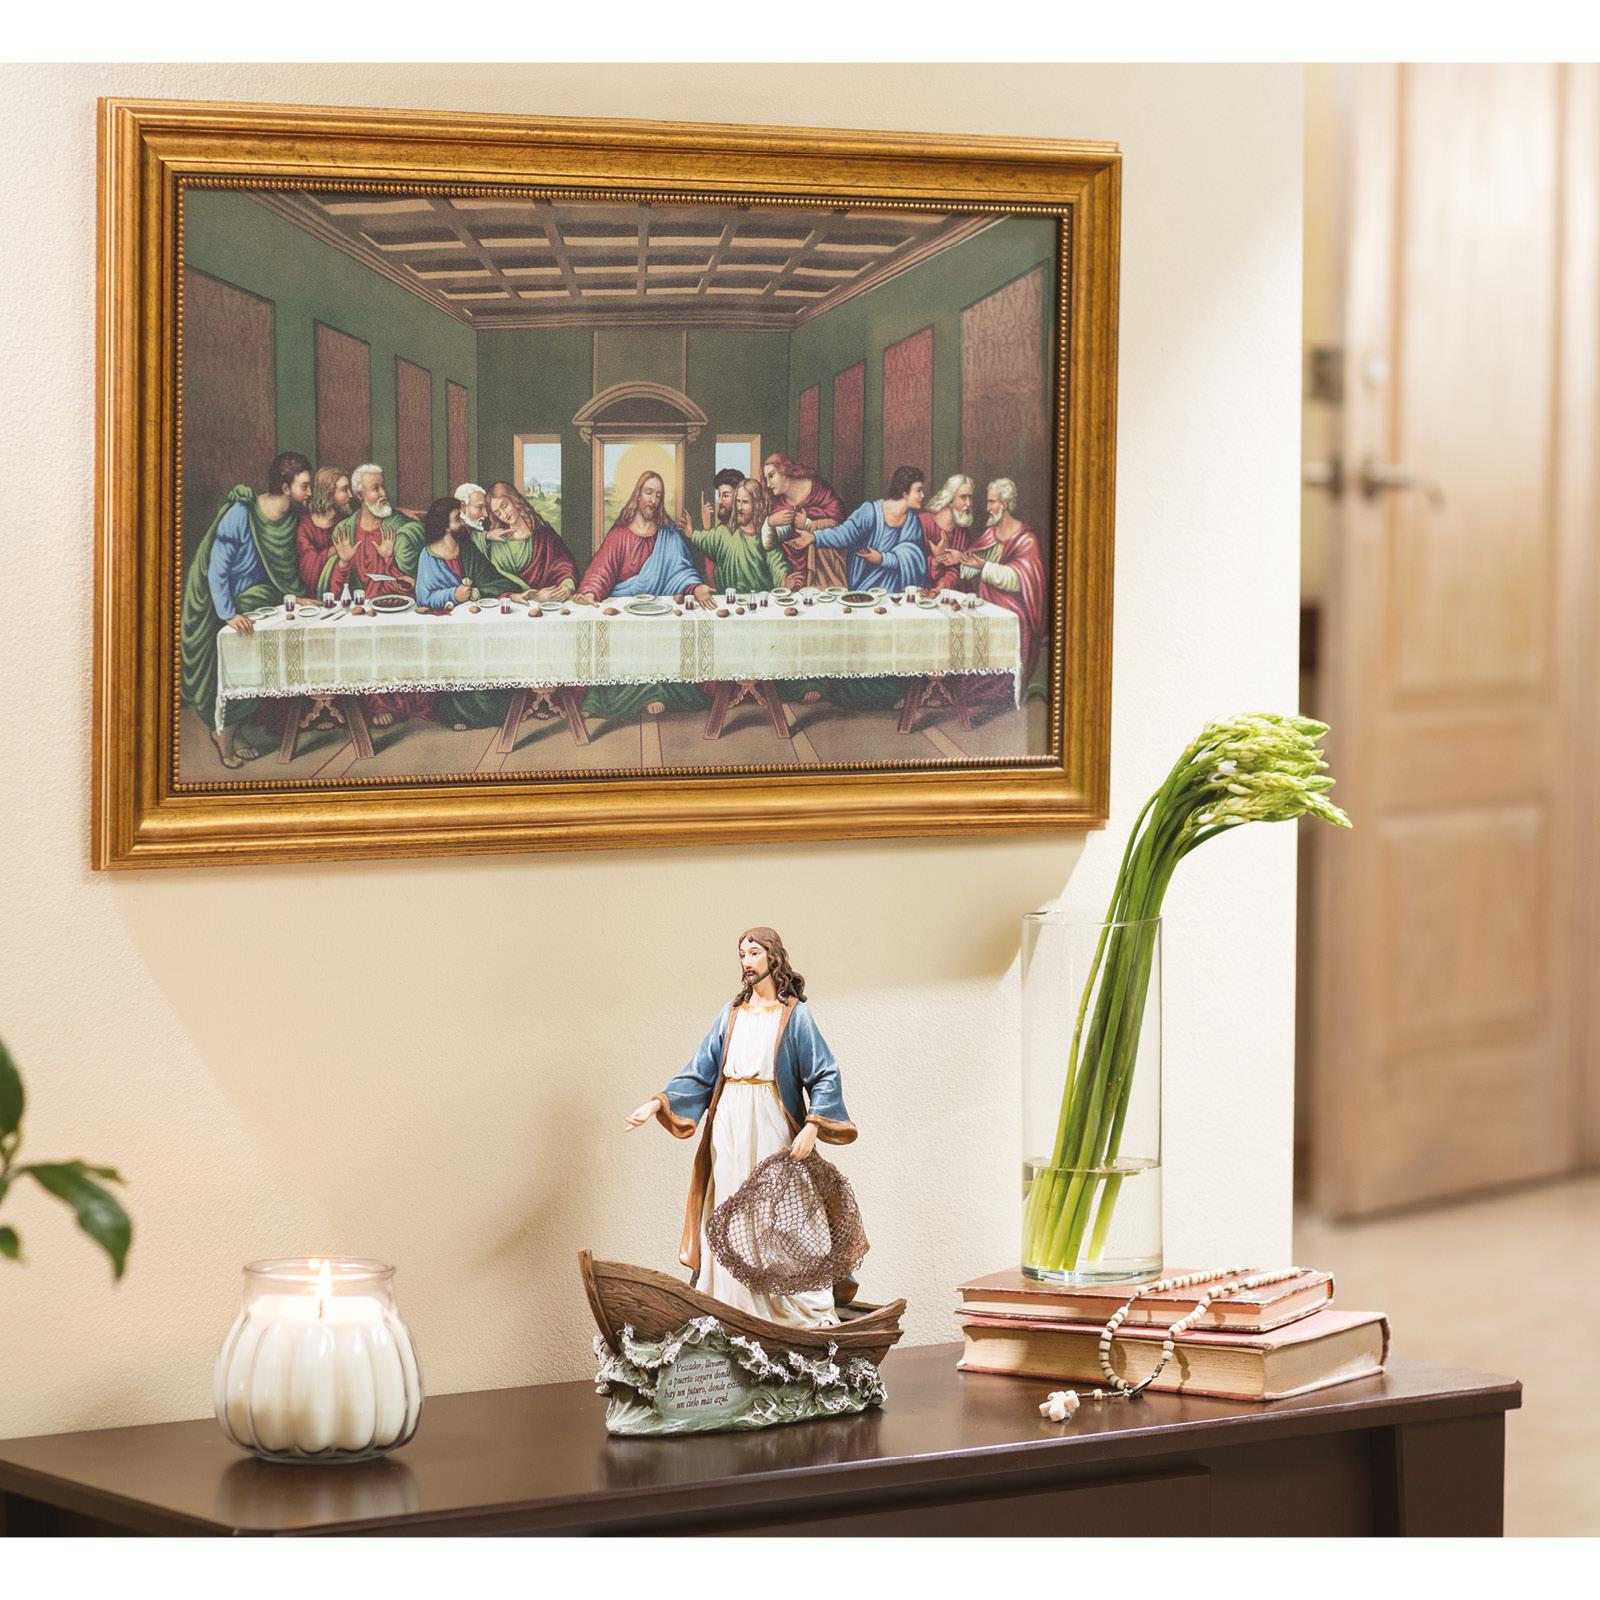 13997   Cuadro 'La Última Cena de Jesús'   Home Interiors ...